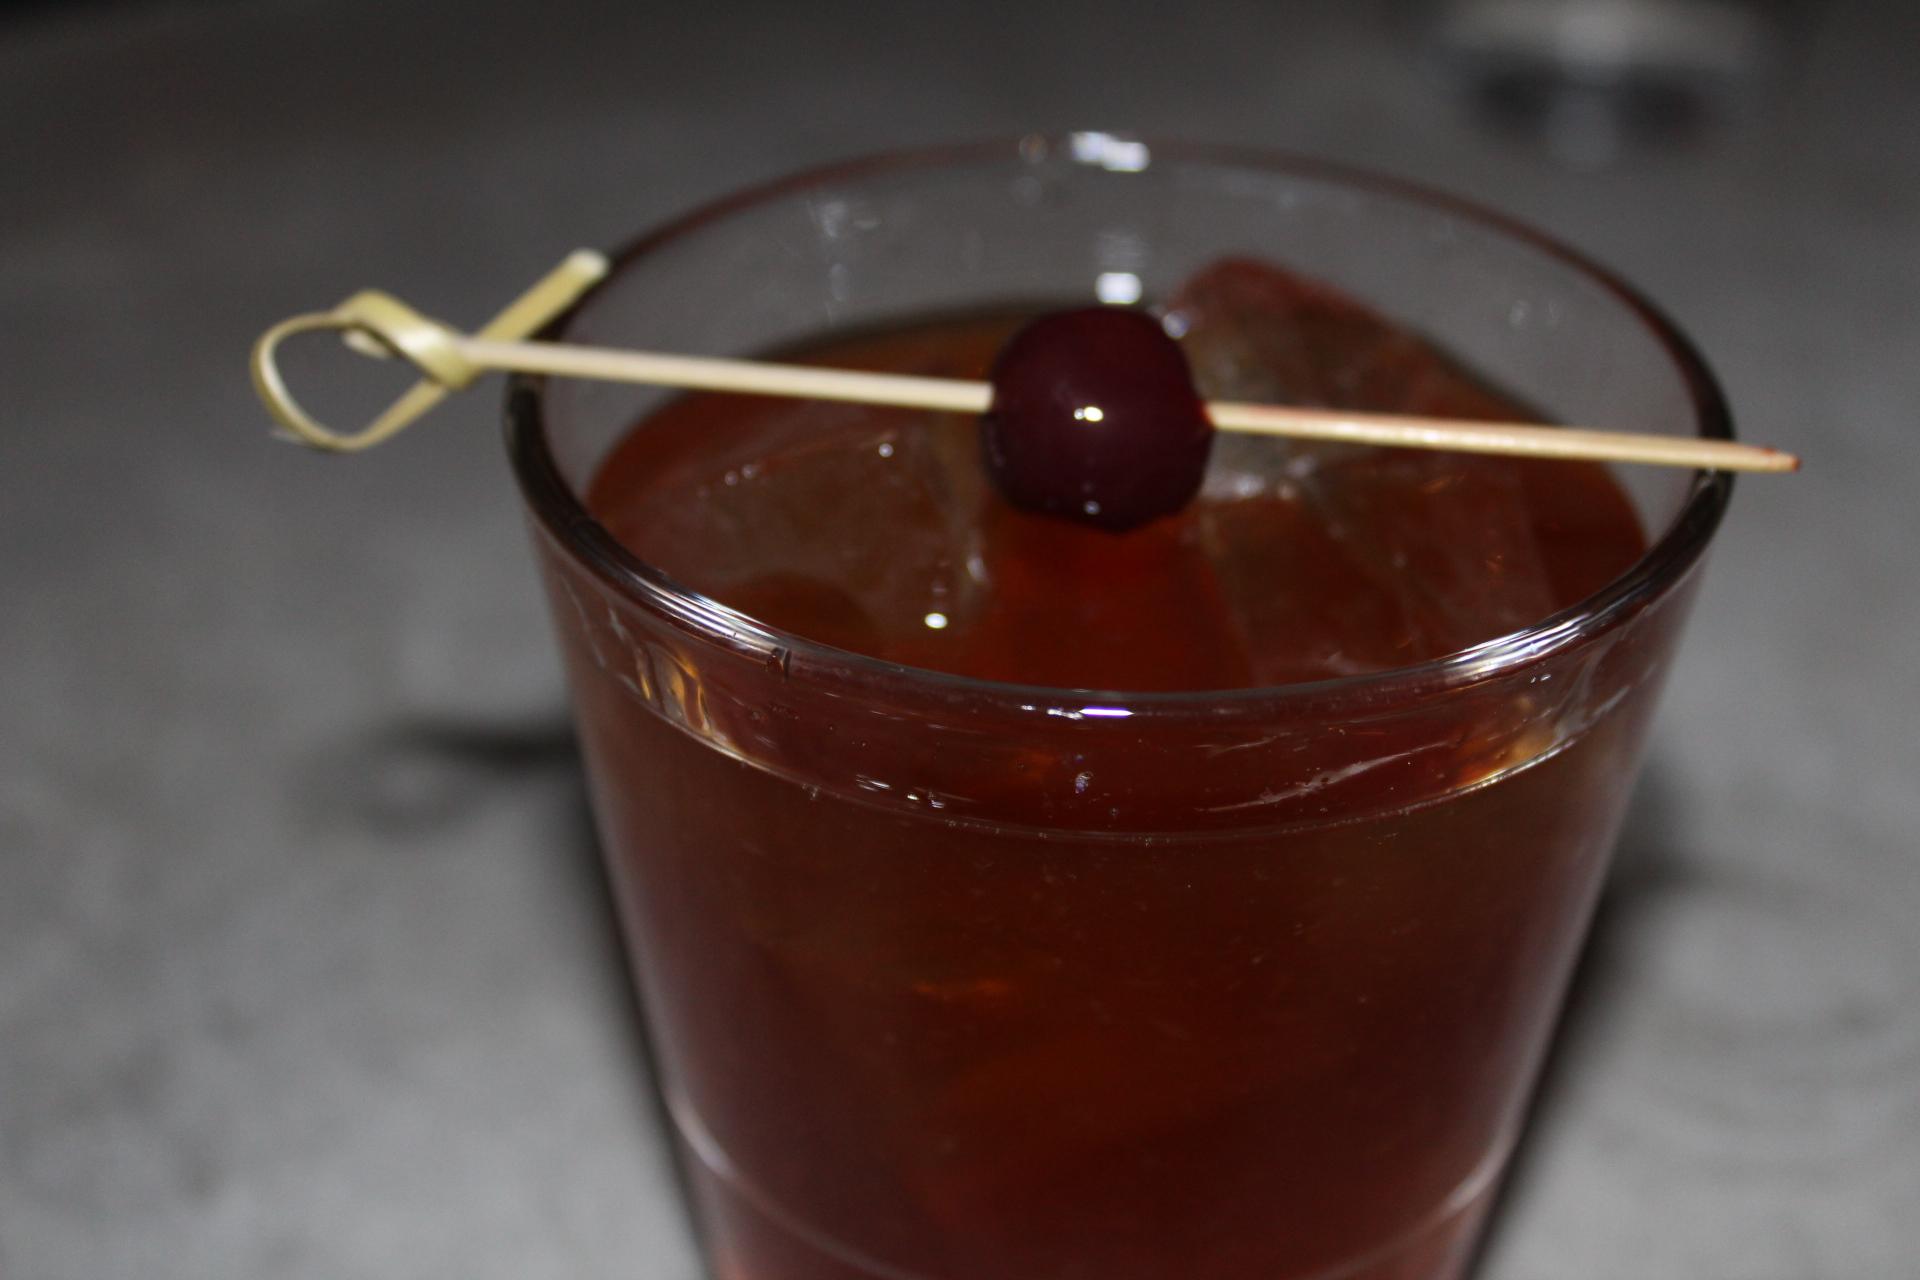 LIKE A VIRGIL - Virgil Kaine Bourbon, Carpano Antica Vermouth, Angostura Bitters